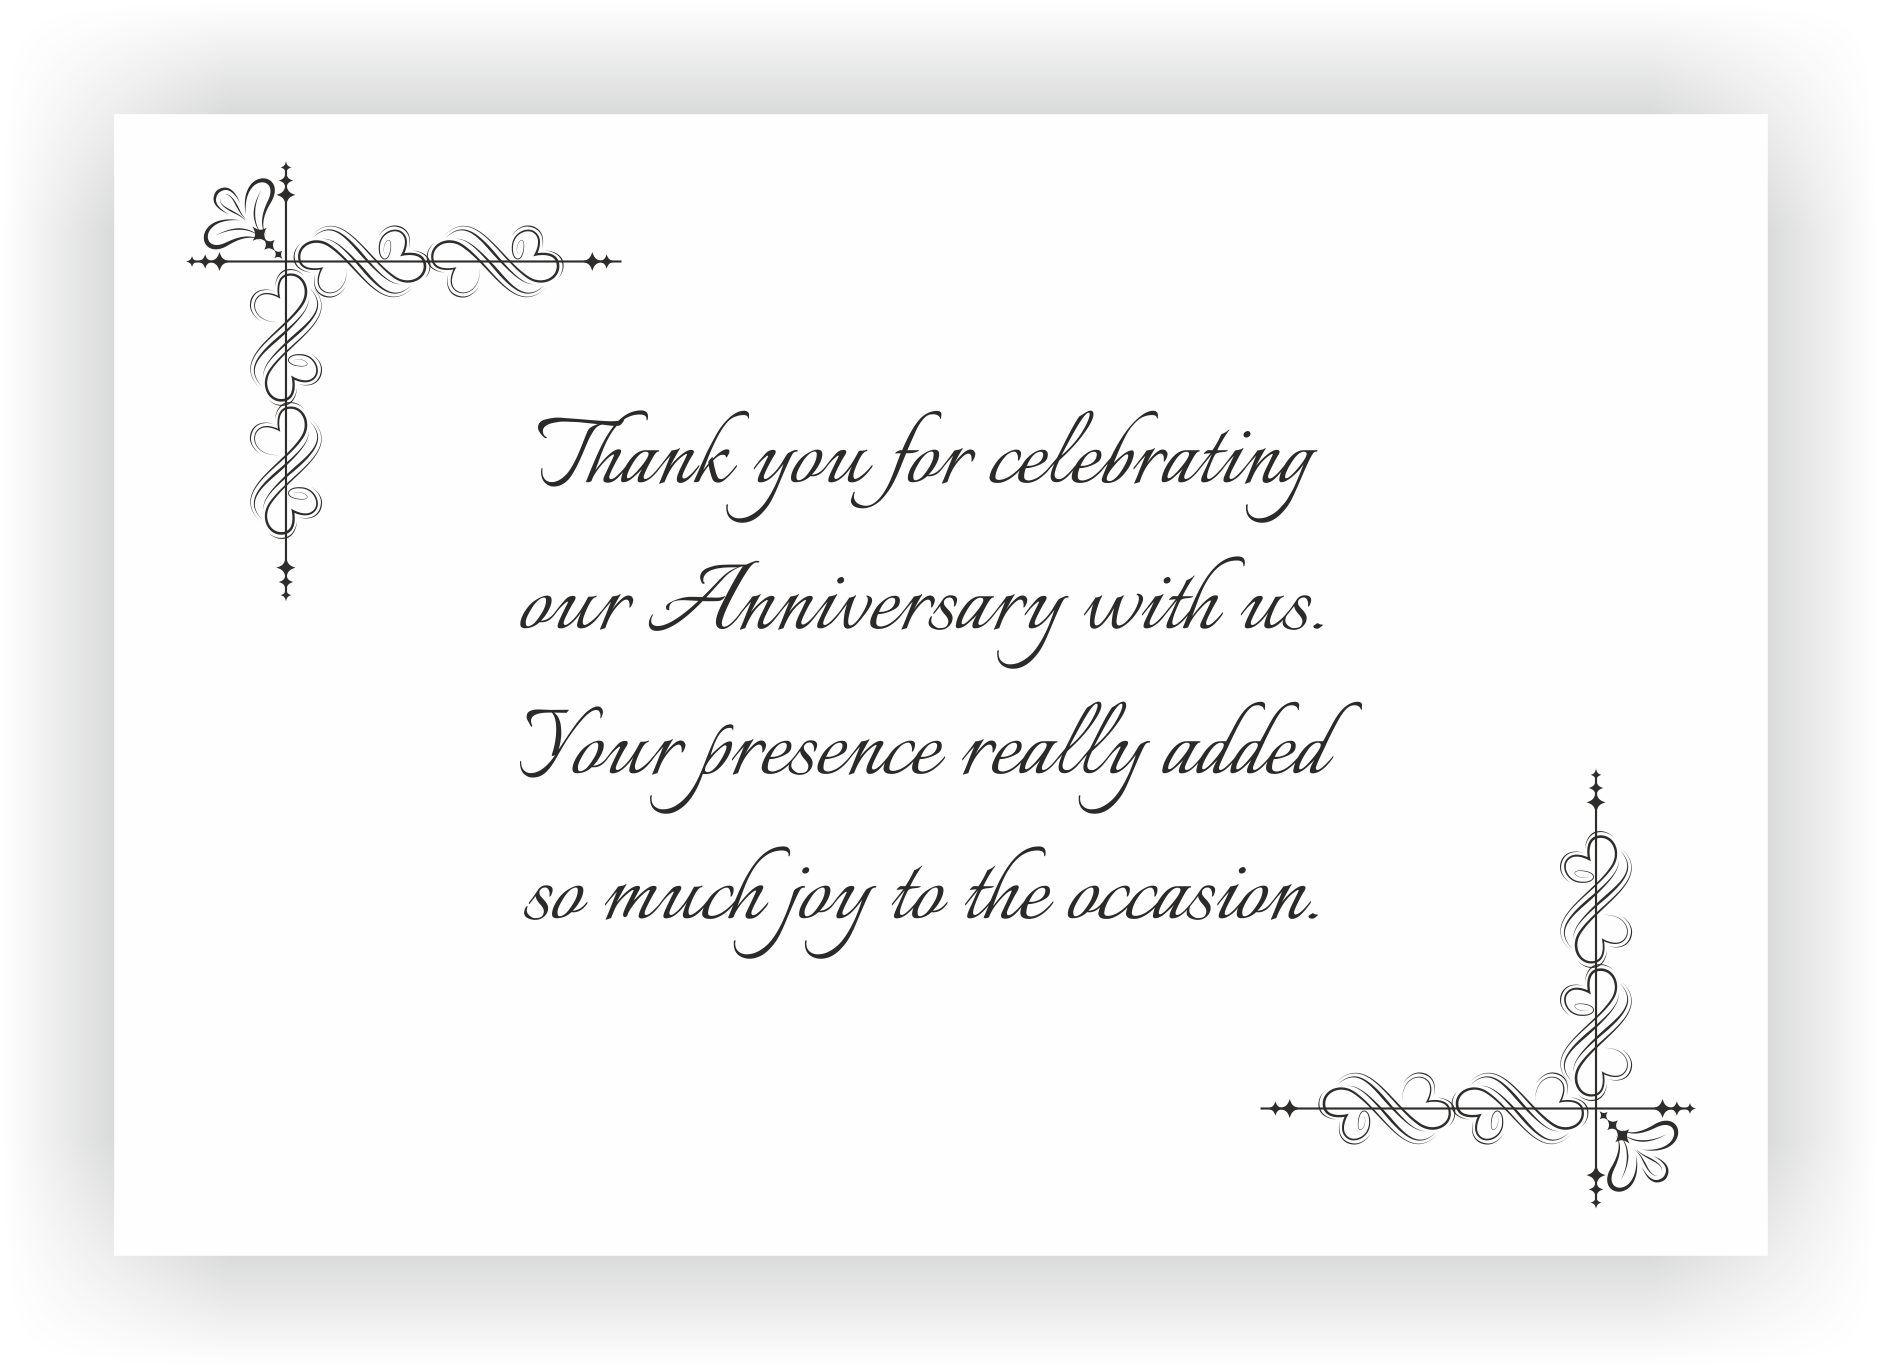 Wedding Return Gifts For Friends: Wedding Anniversary Return Gift Wording